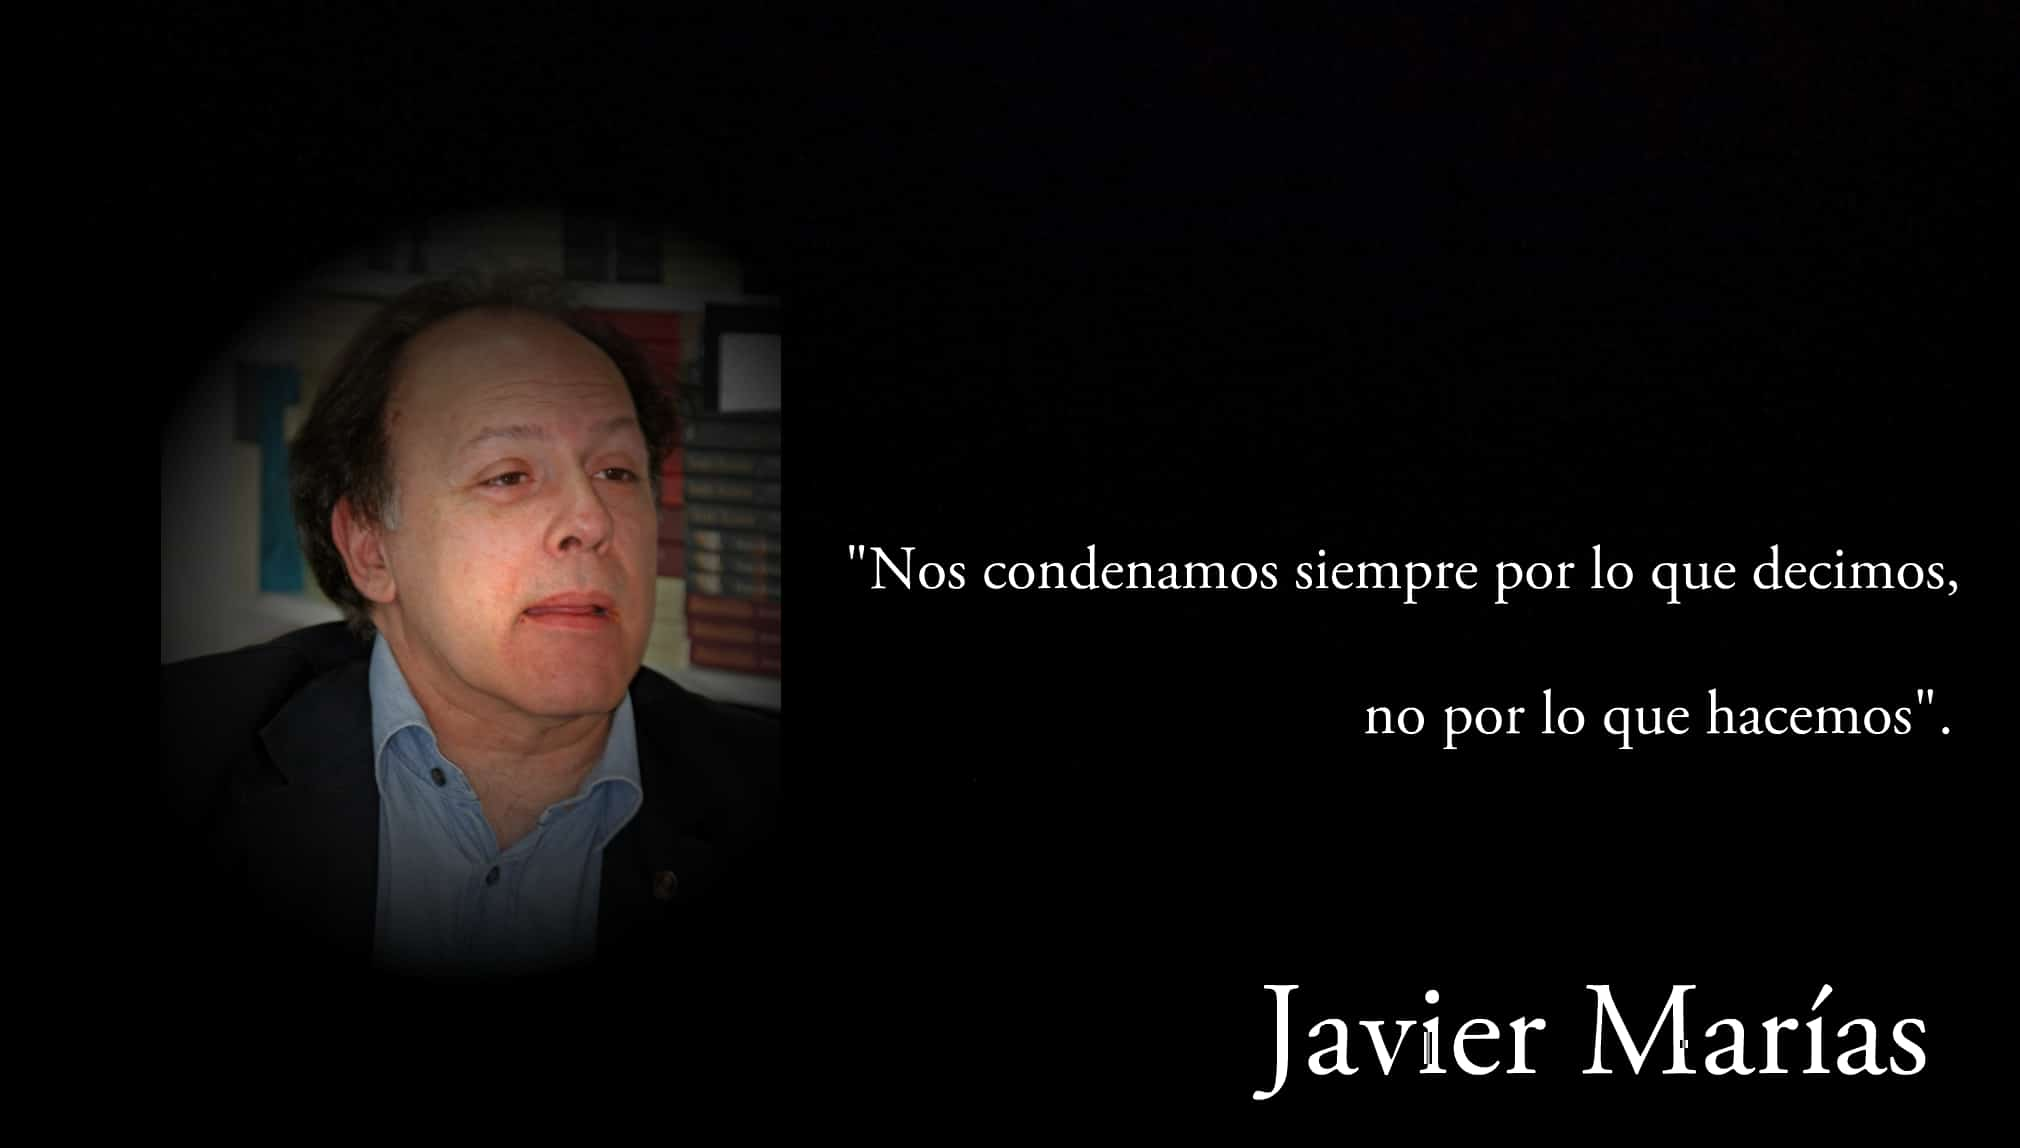 Frase de Javier Marías.